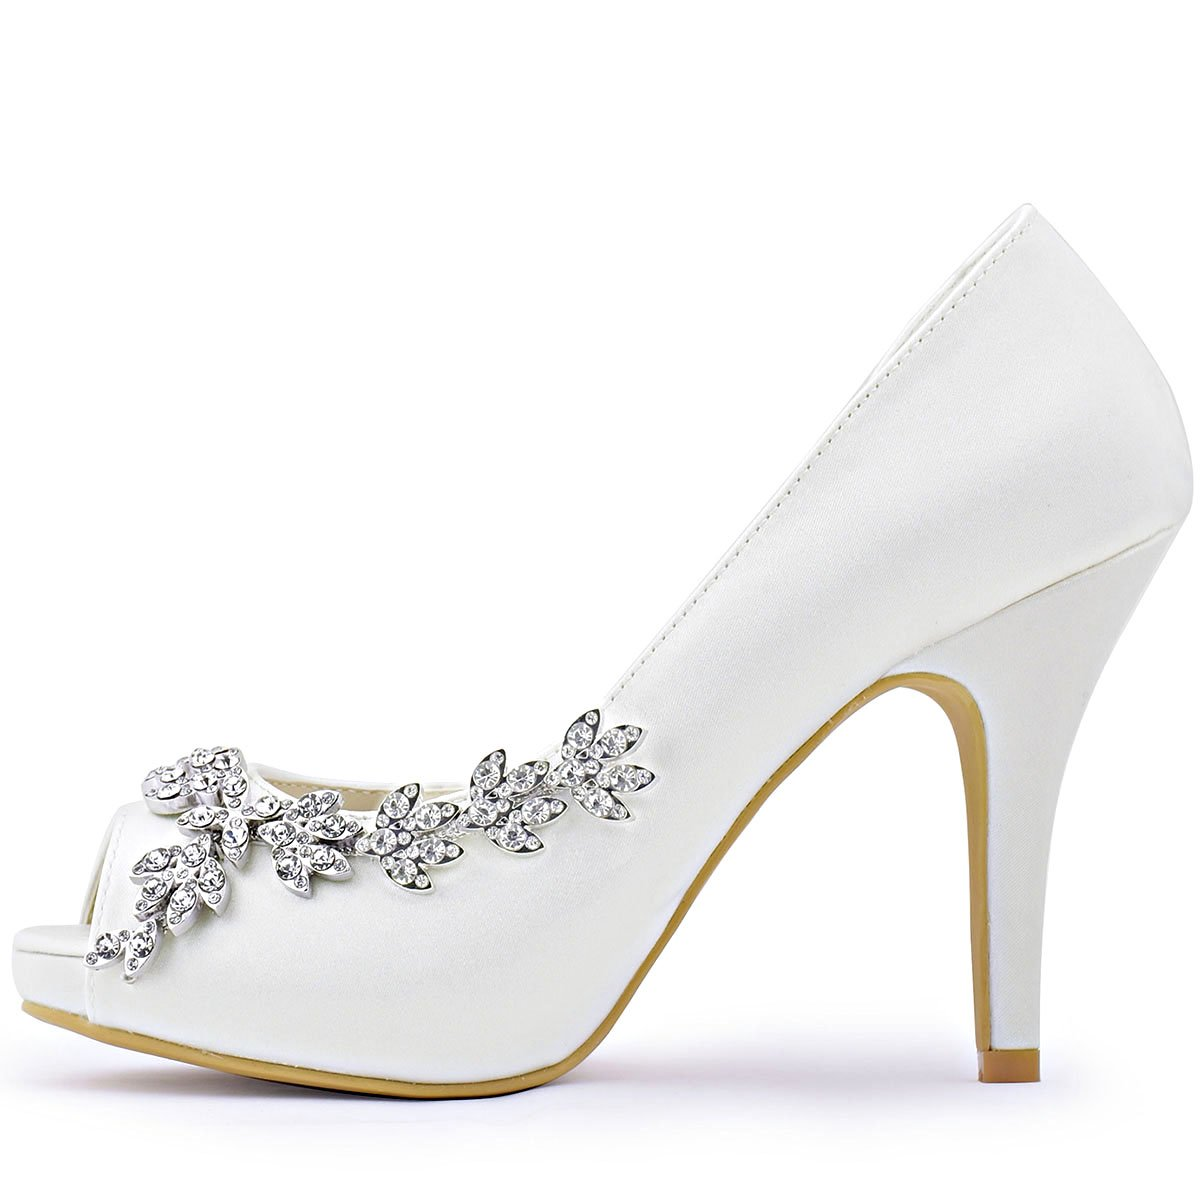 2e412ac89c1b ... ElegantPark Women s Peep Toe Toe Toe Platform High Heel Rhinestones  Satin Evening Prom Wedding Shoes B018THY4JS ...